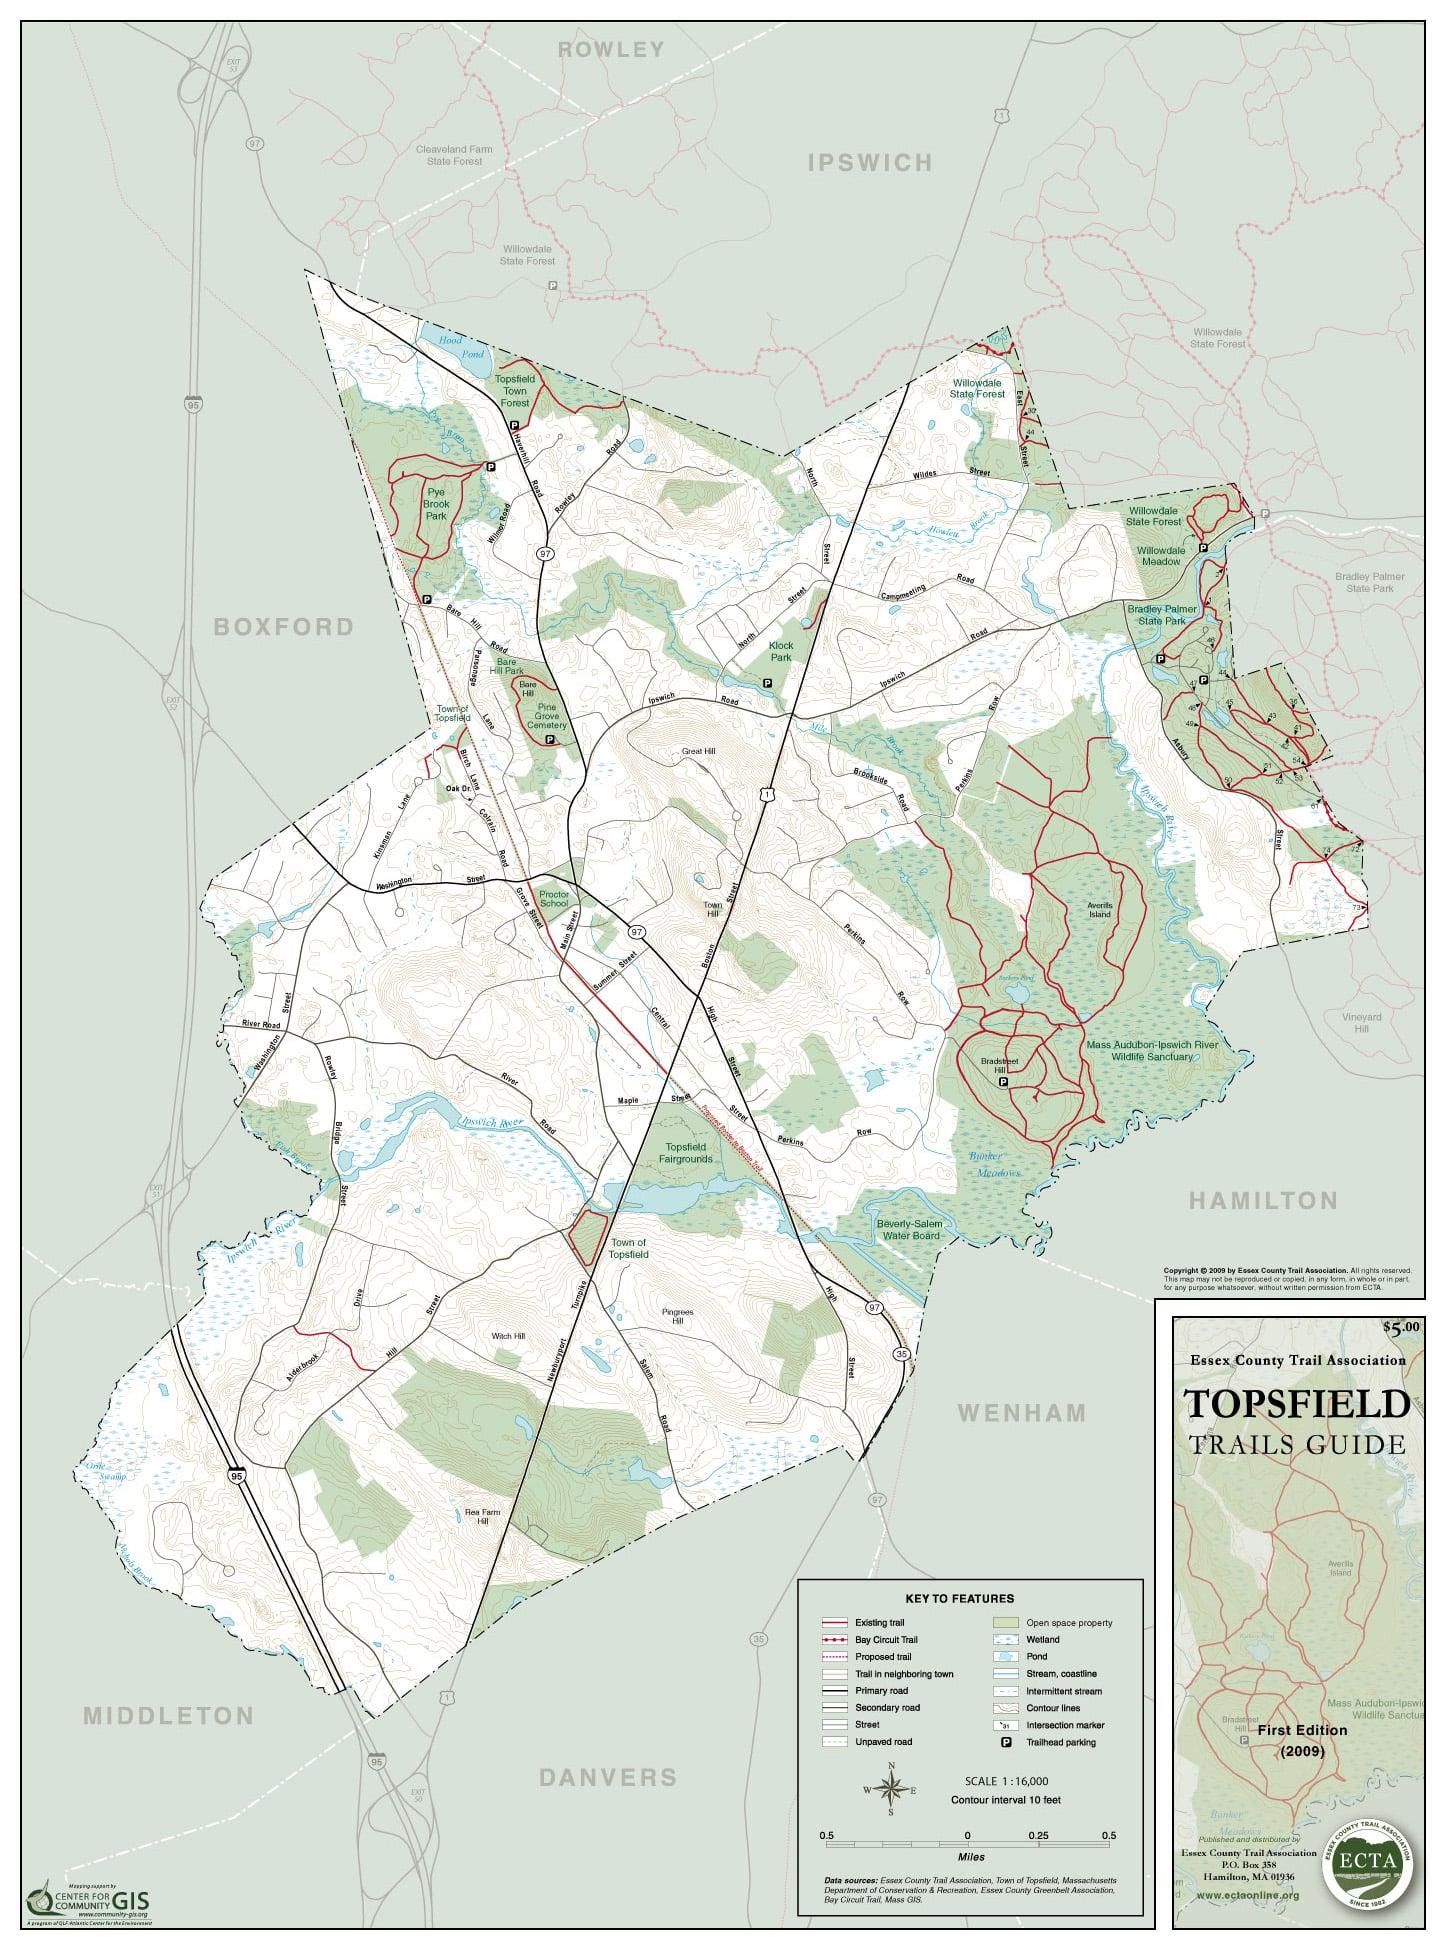 Buy an ECTA Trail Map | Essex County Trail ociation Buy Maps on